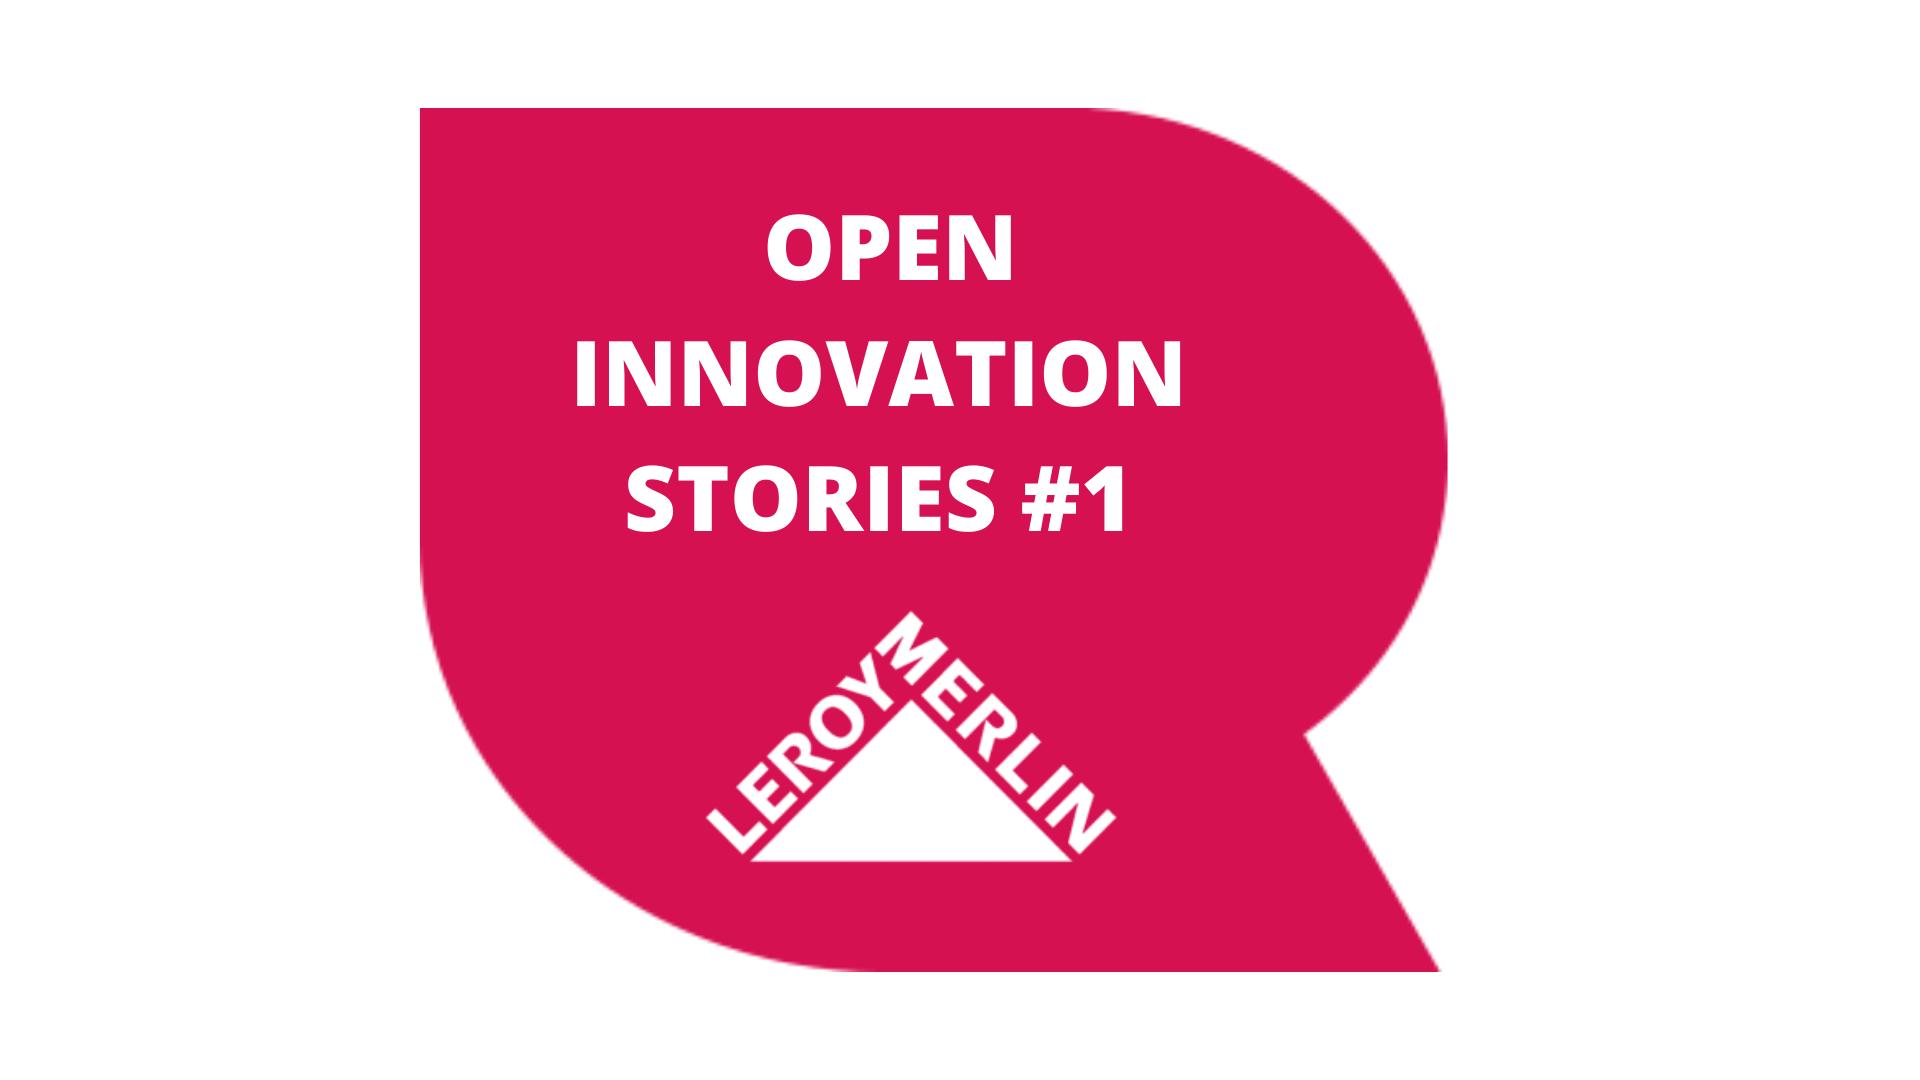 OPEN INNOVATION STORIES  #1